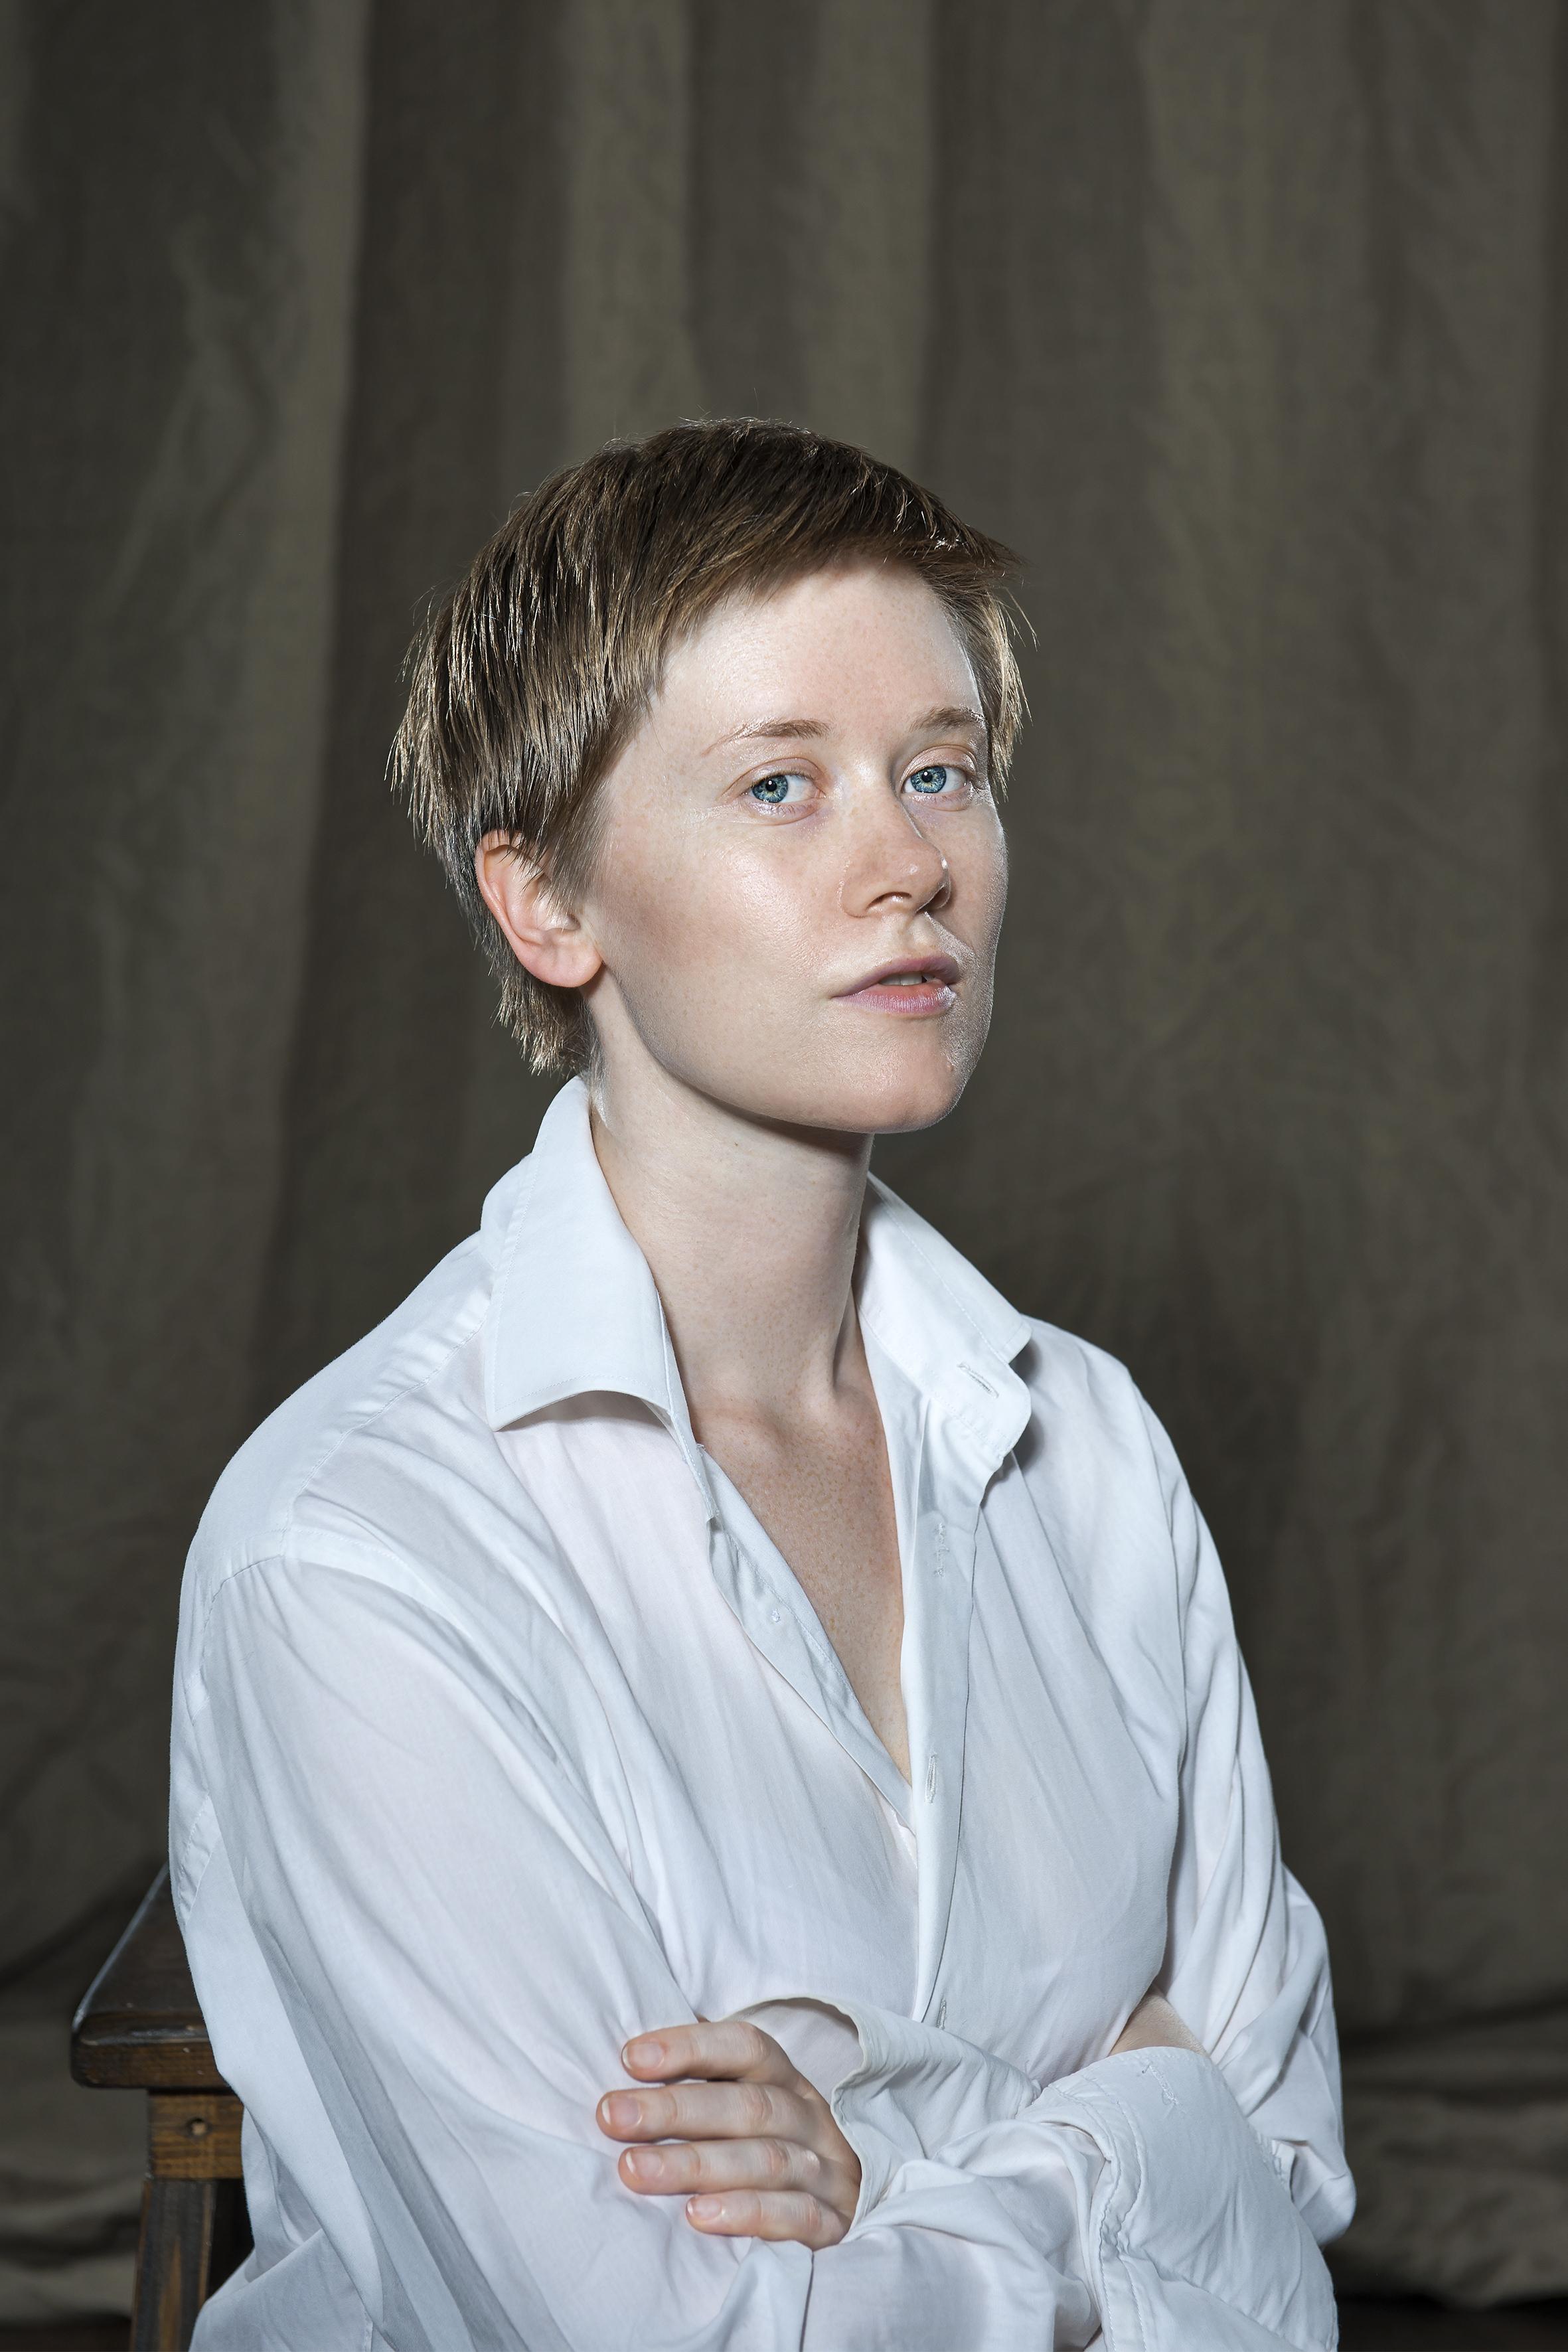 Hanna, Portrait ©Maryna Blanke